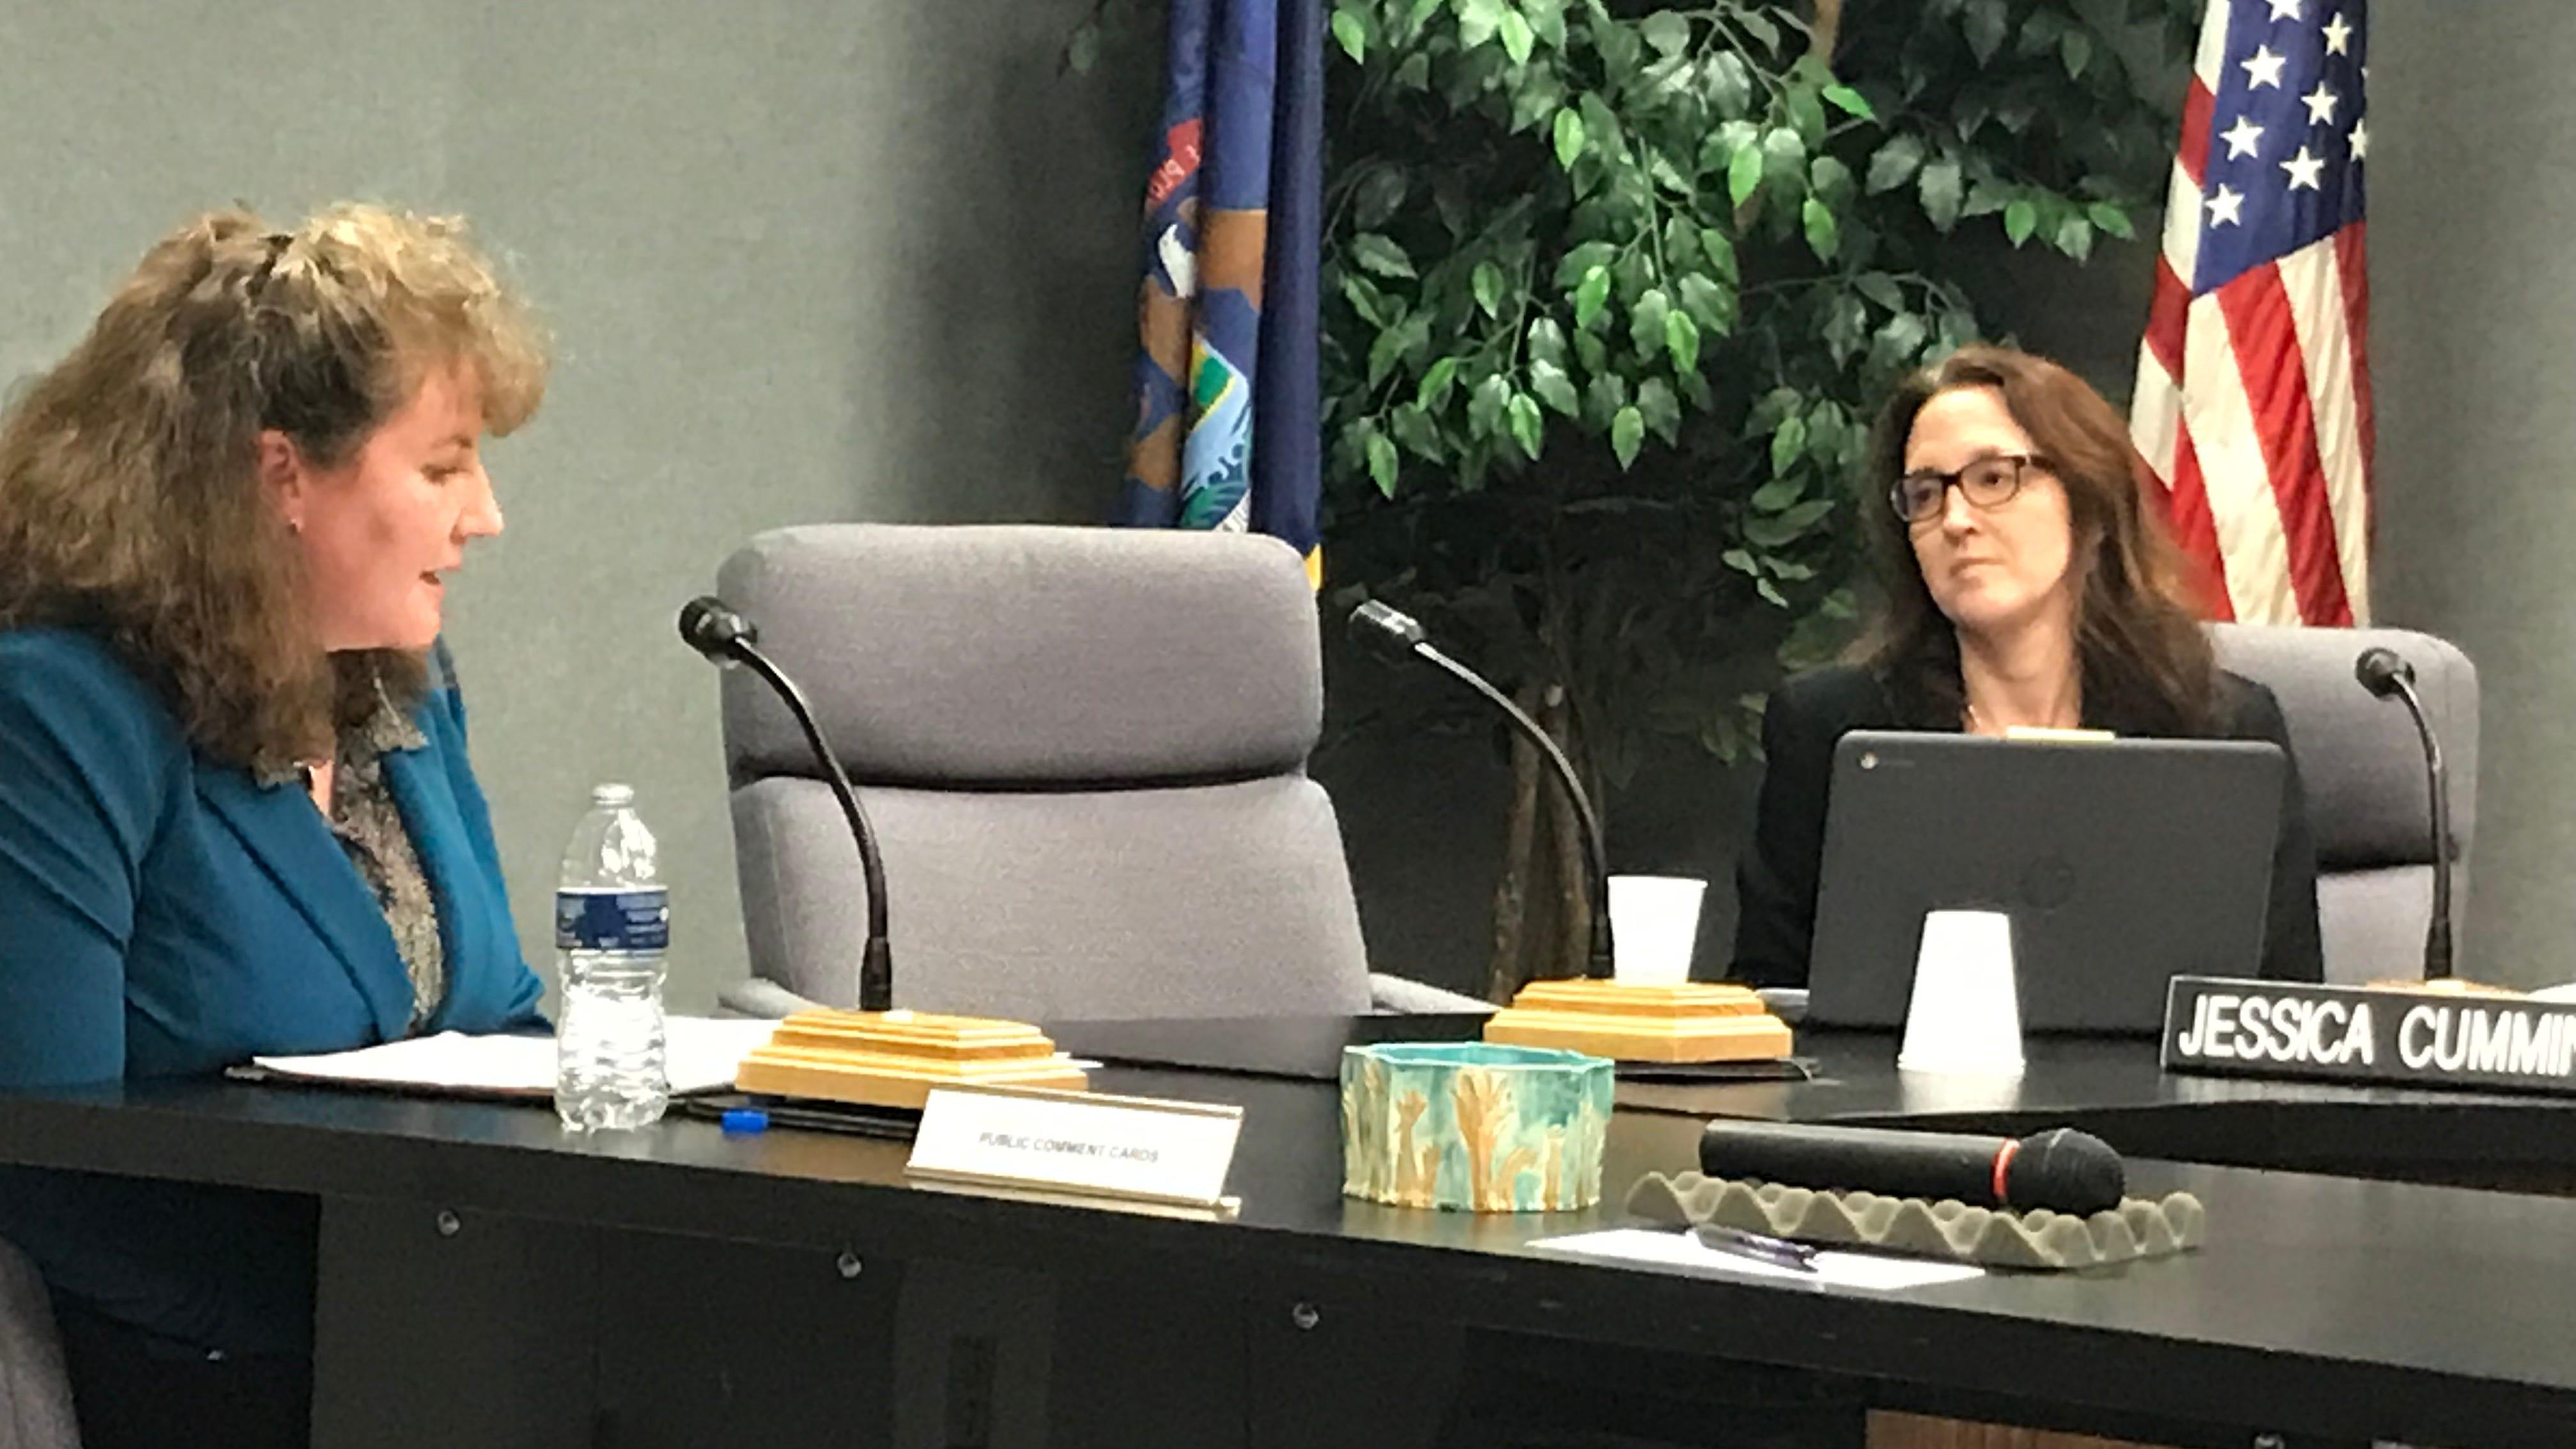 Jennifer Garland (left) responds to questions from Farmington Board of Education Trustee Jessica Cummings.